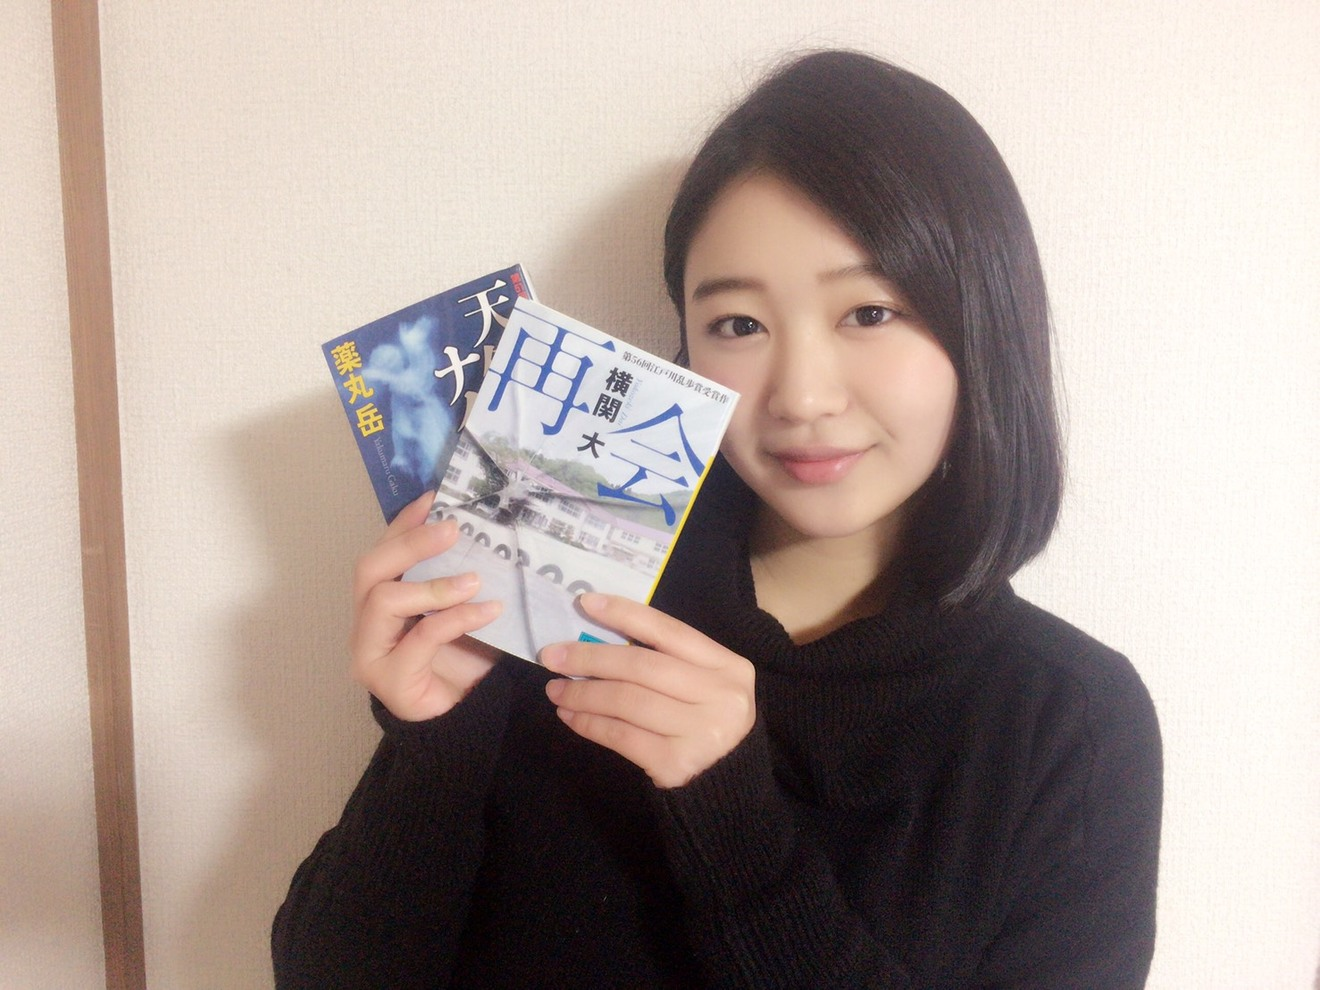 SUPER☆GiRLS内村莉彩がオススメする江戸川乱歩賞受賞作